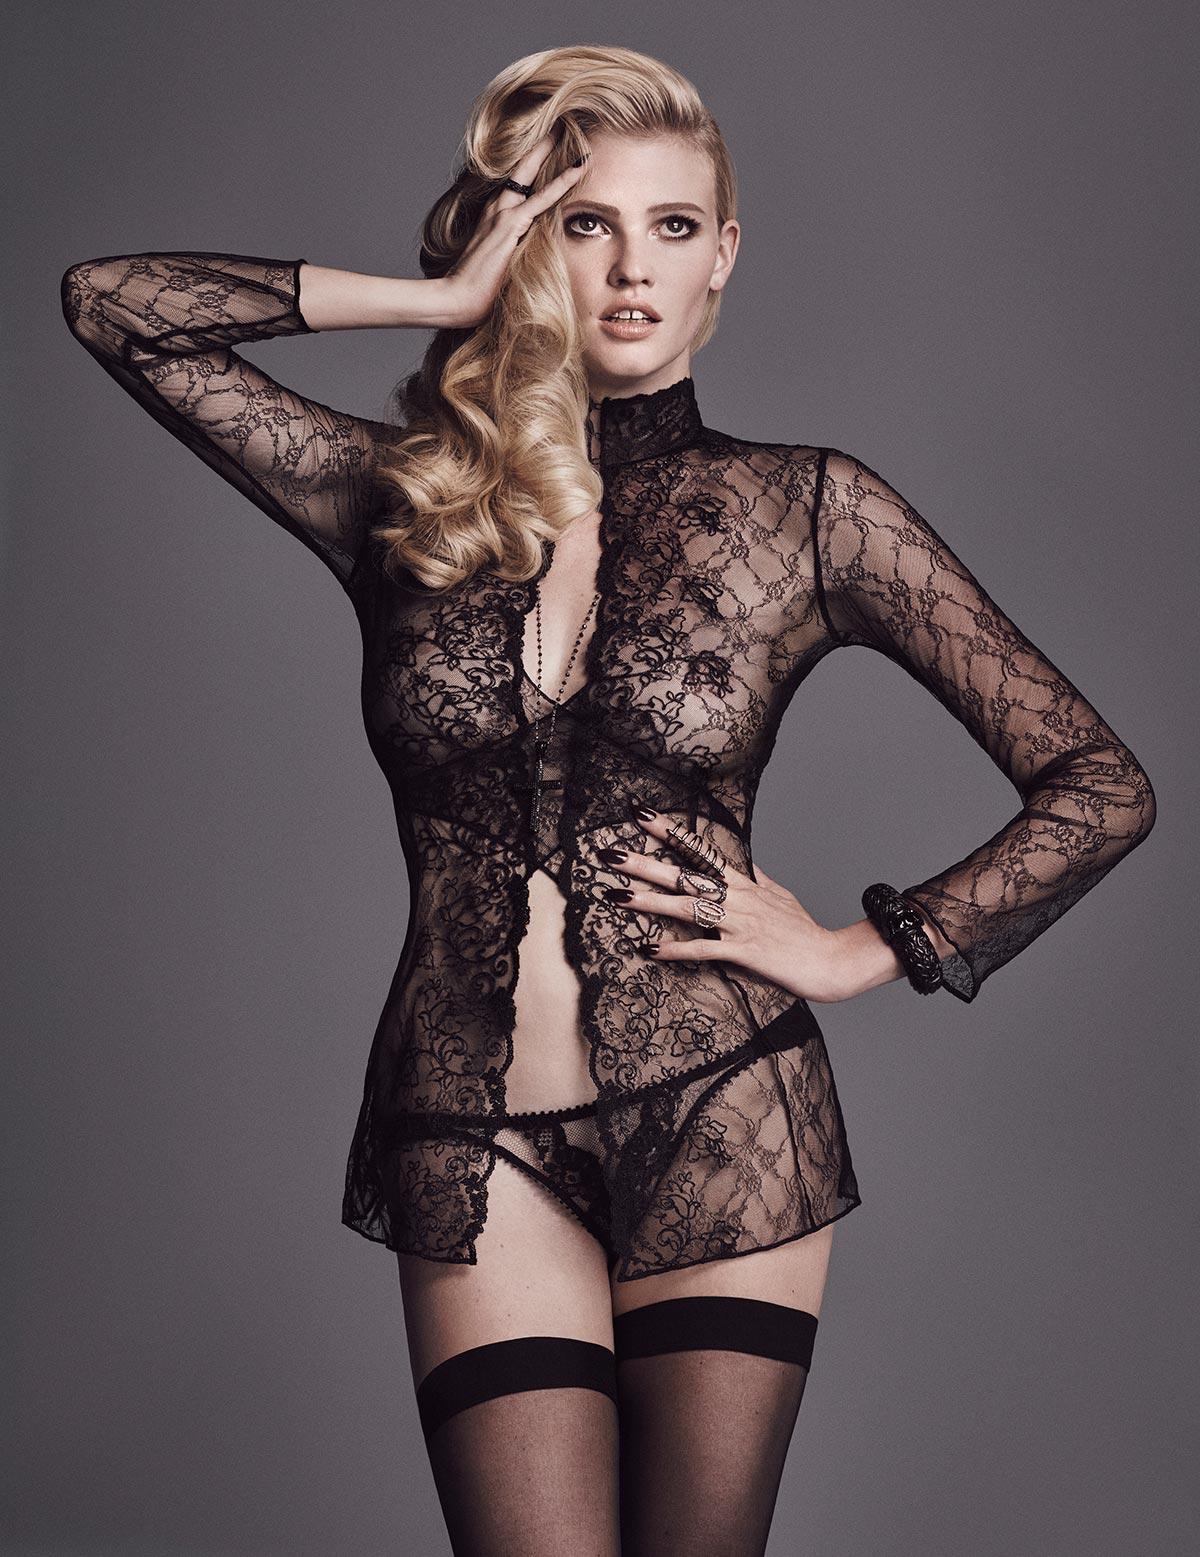 Lara Stone topless photos (4)